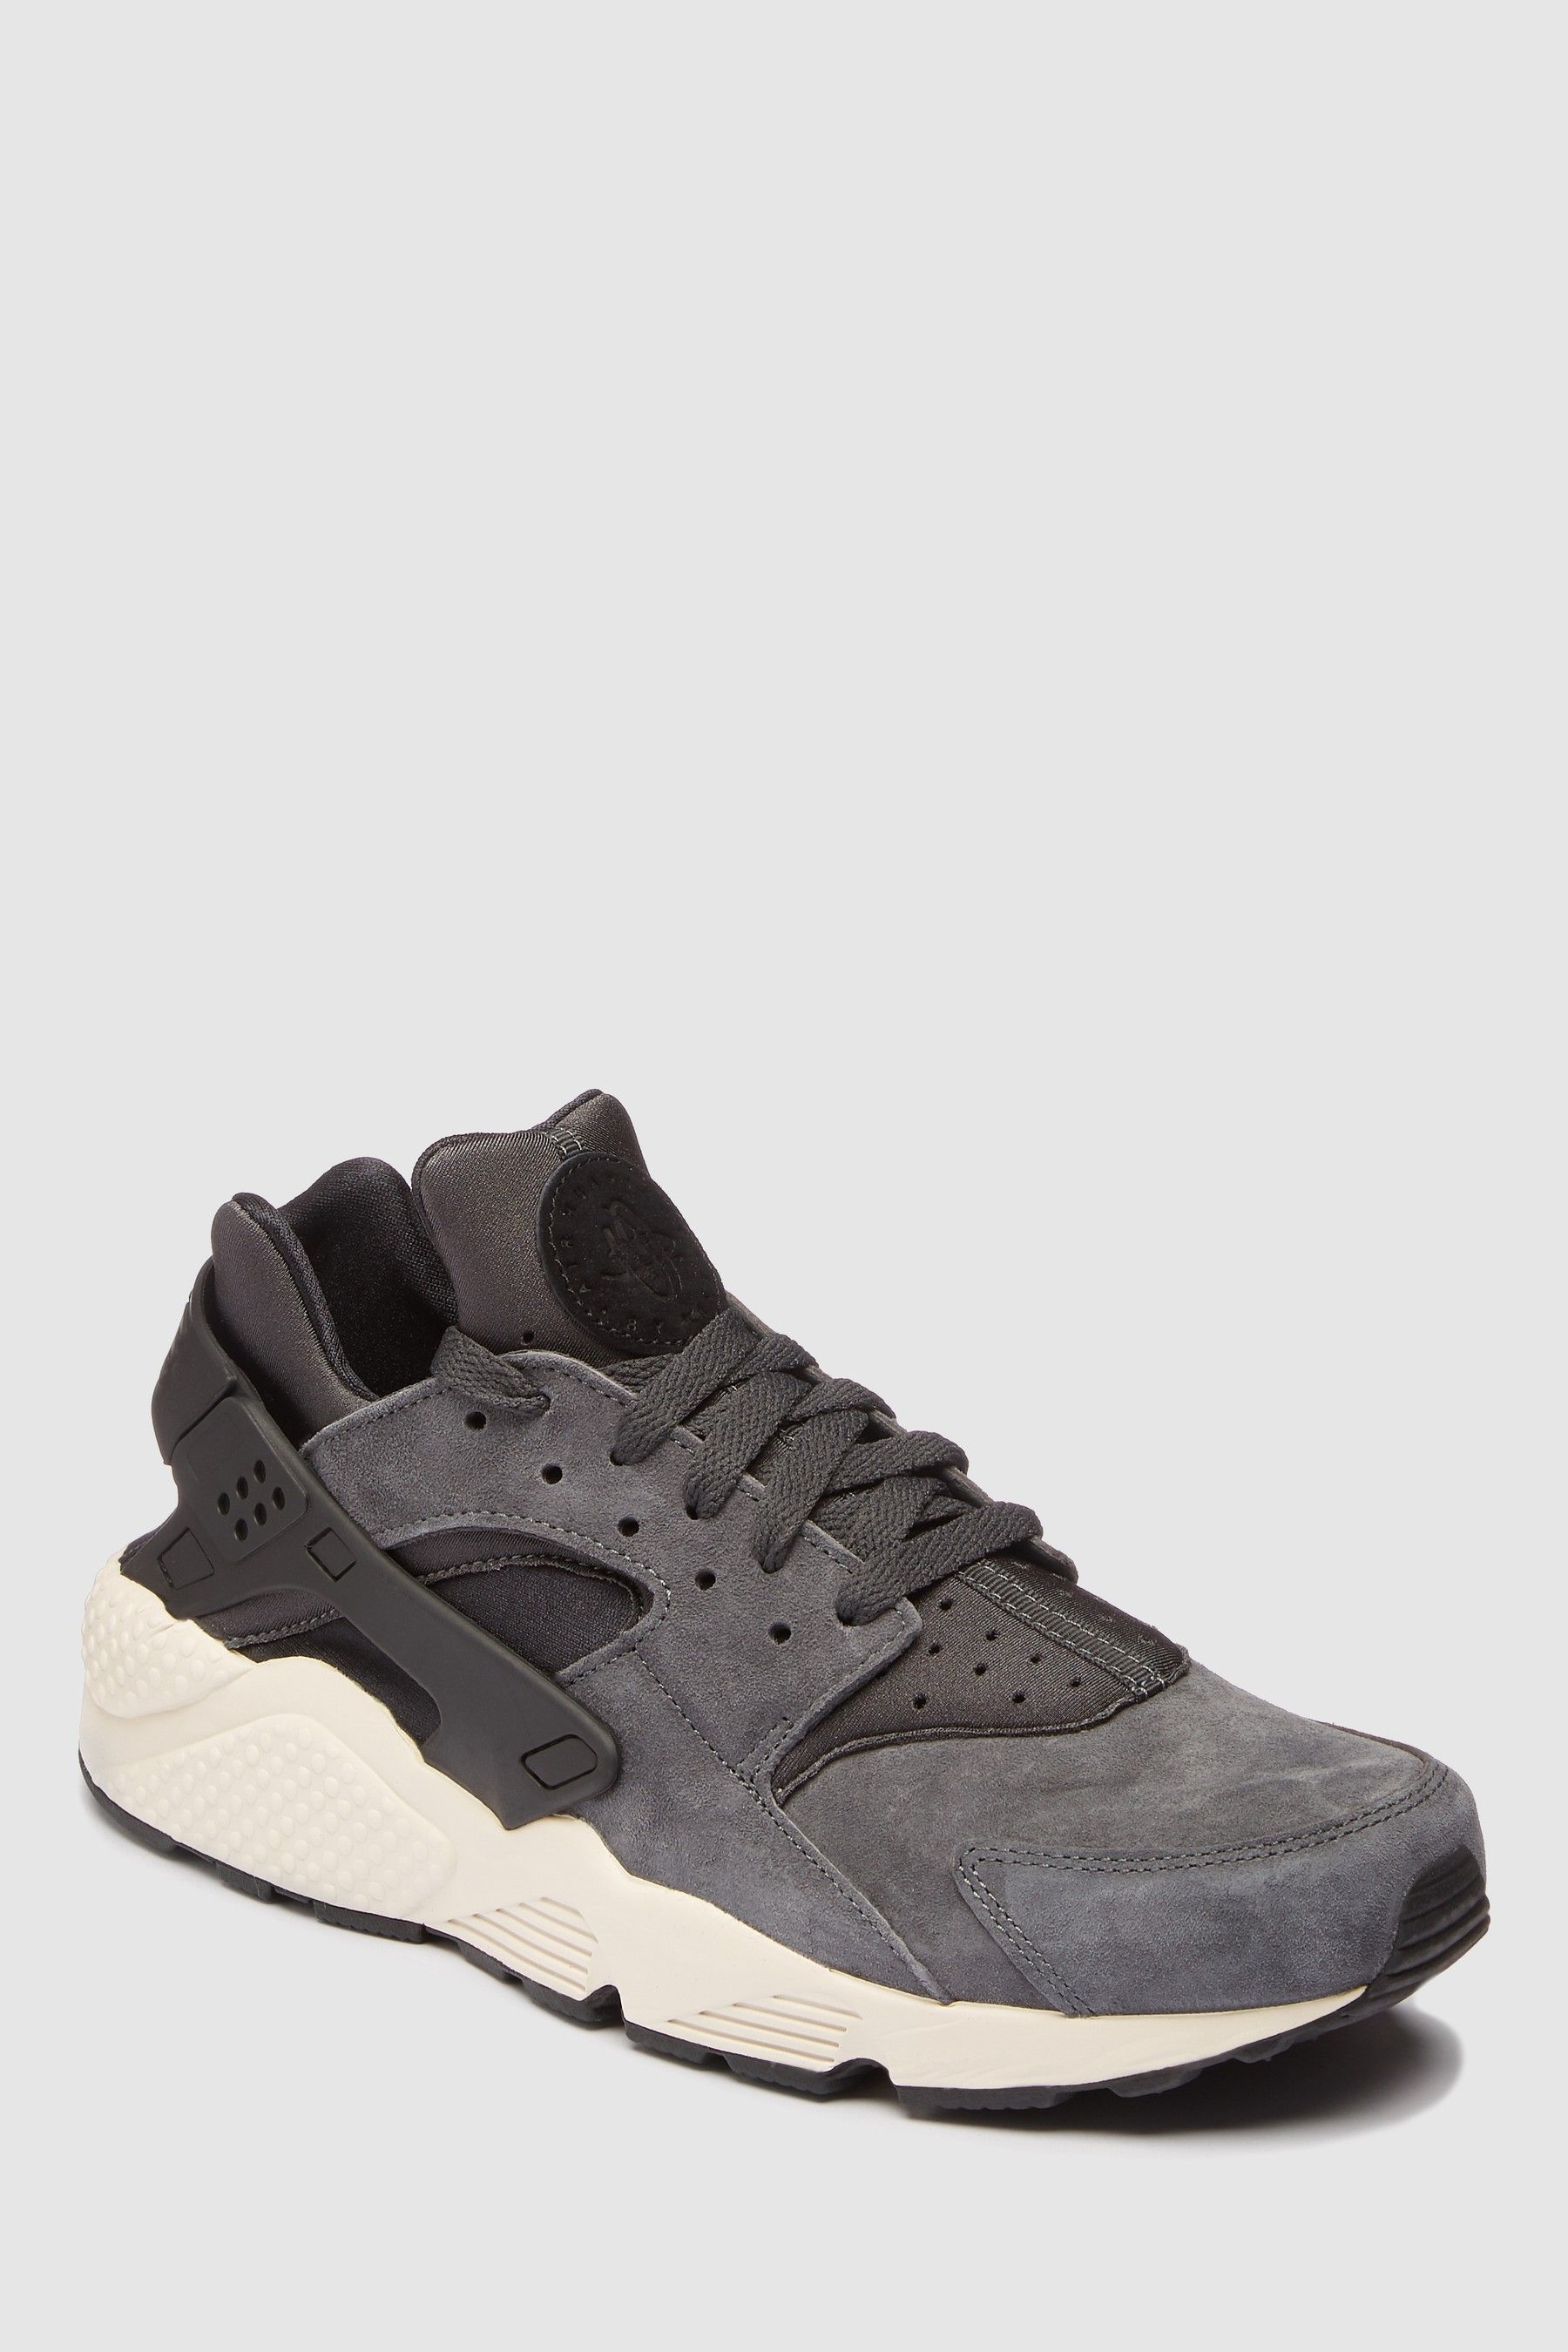 san francisco 9f124 f97a4 Mens Nike Black Huarache Premium - Black